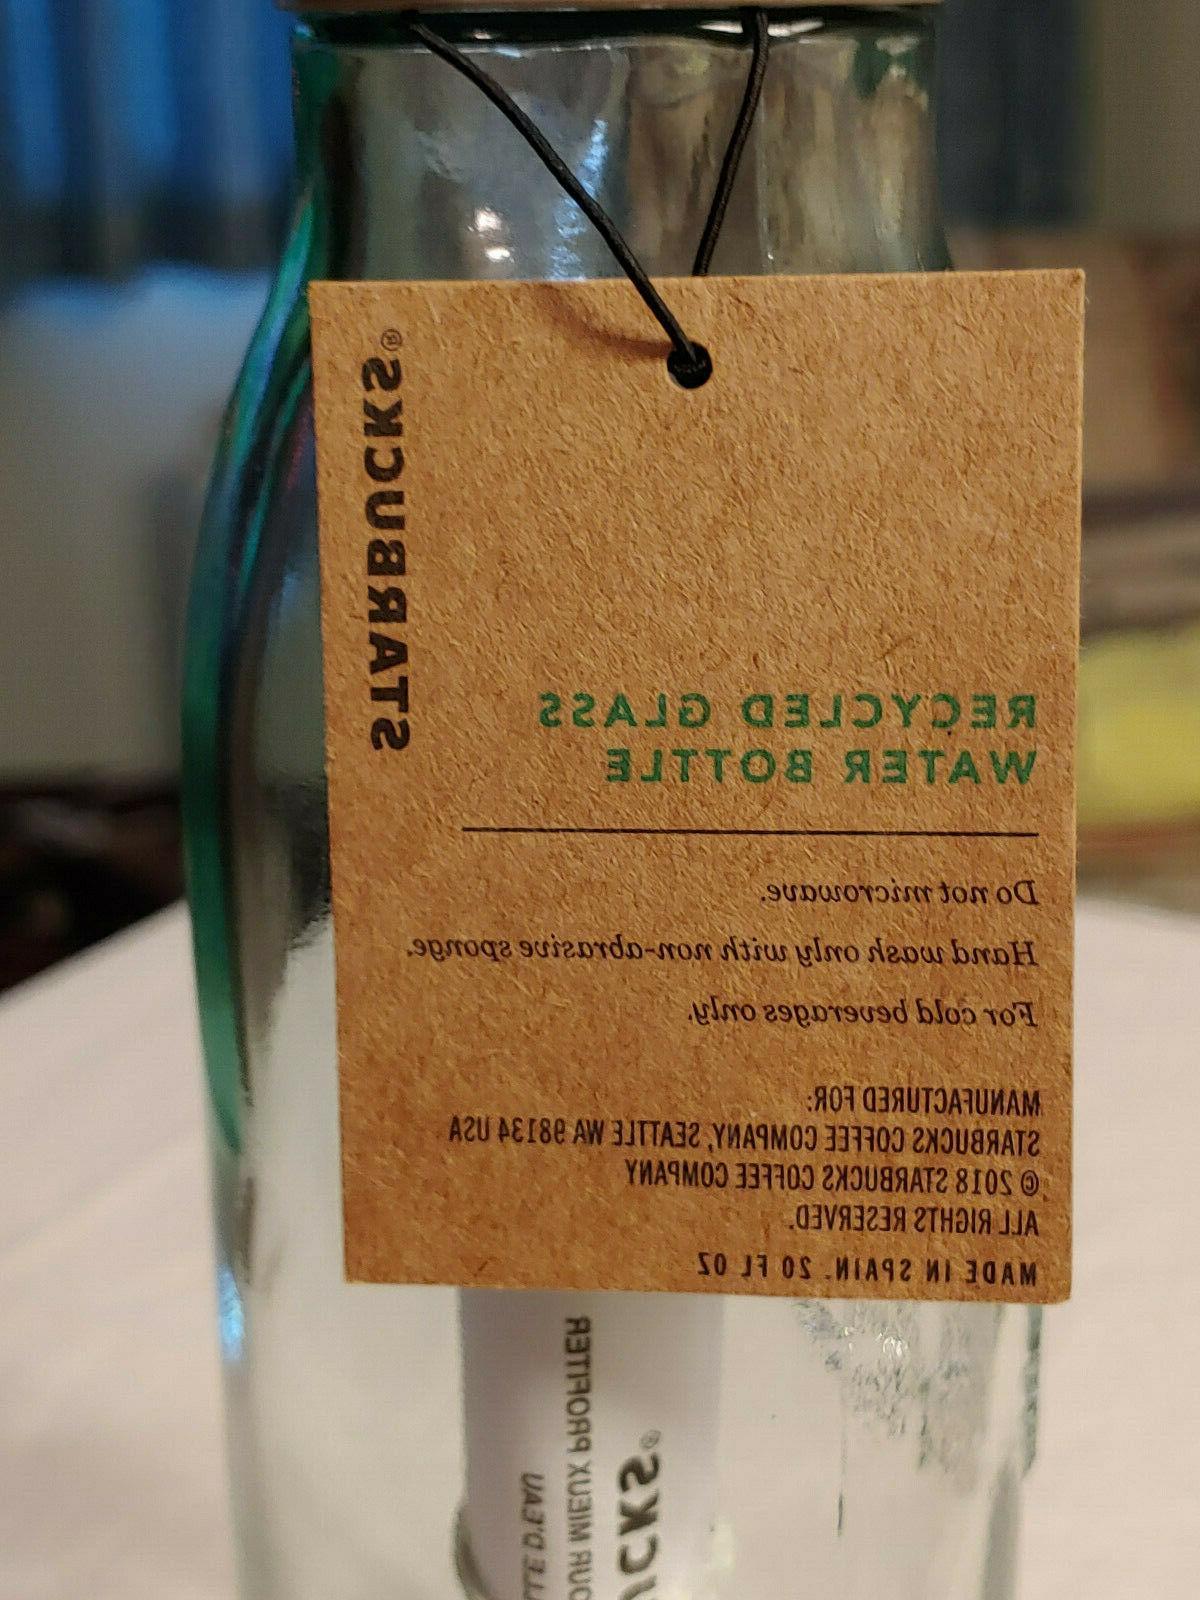 Starbucks 20oz Water Bottle. In Spain. *NEW*